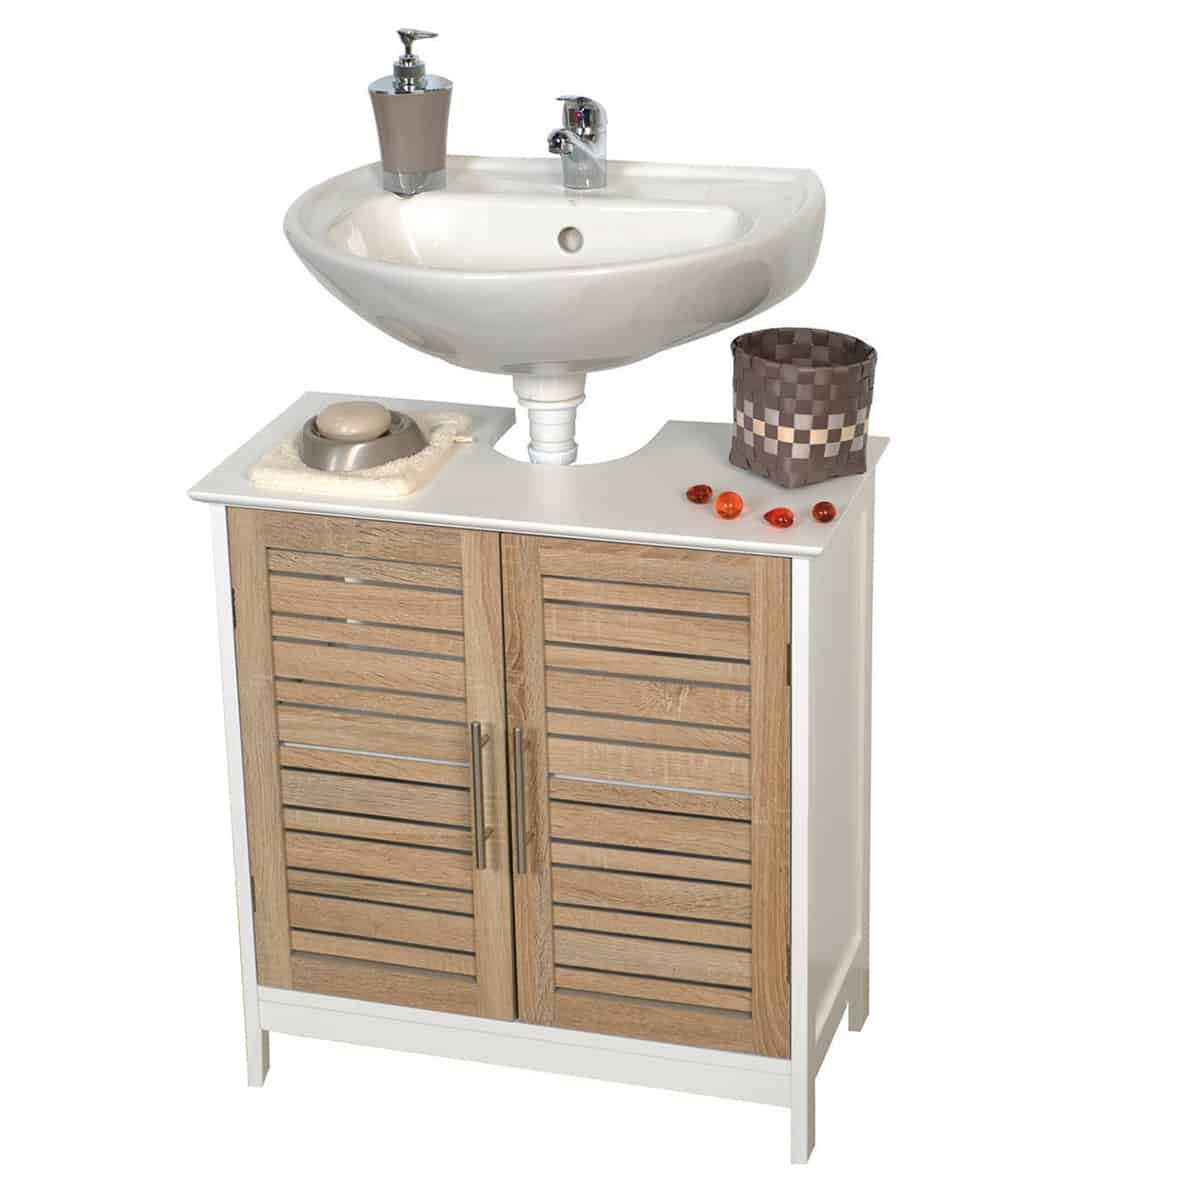 Freestanding Non Pedestal Under Sink Vanity Cabinet Bath Storage Wood Stockholm In 2020 Small Bathroom Storage Pedestal Sink Storage Small Bathroom Storage Cabinet